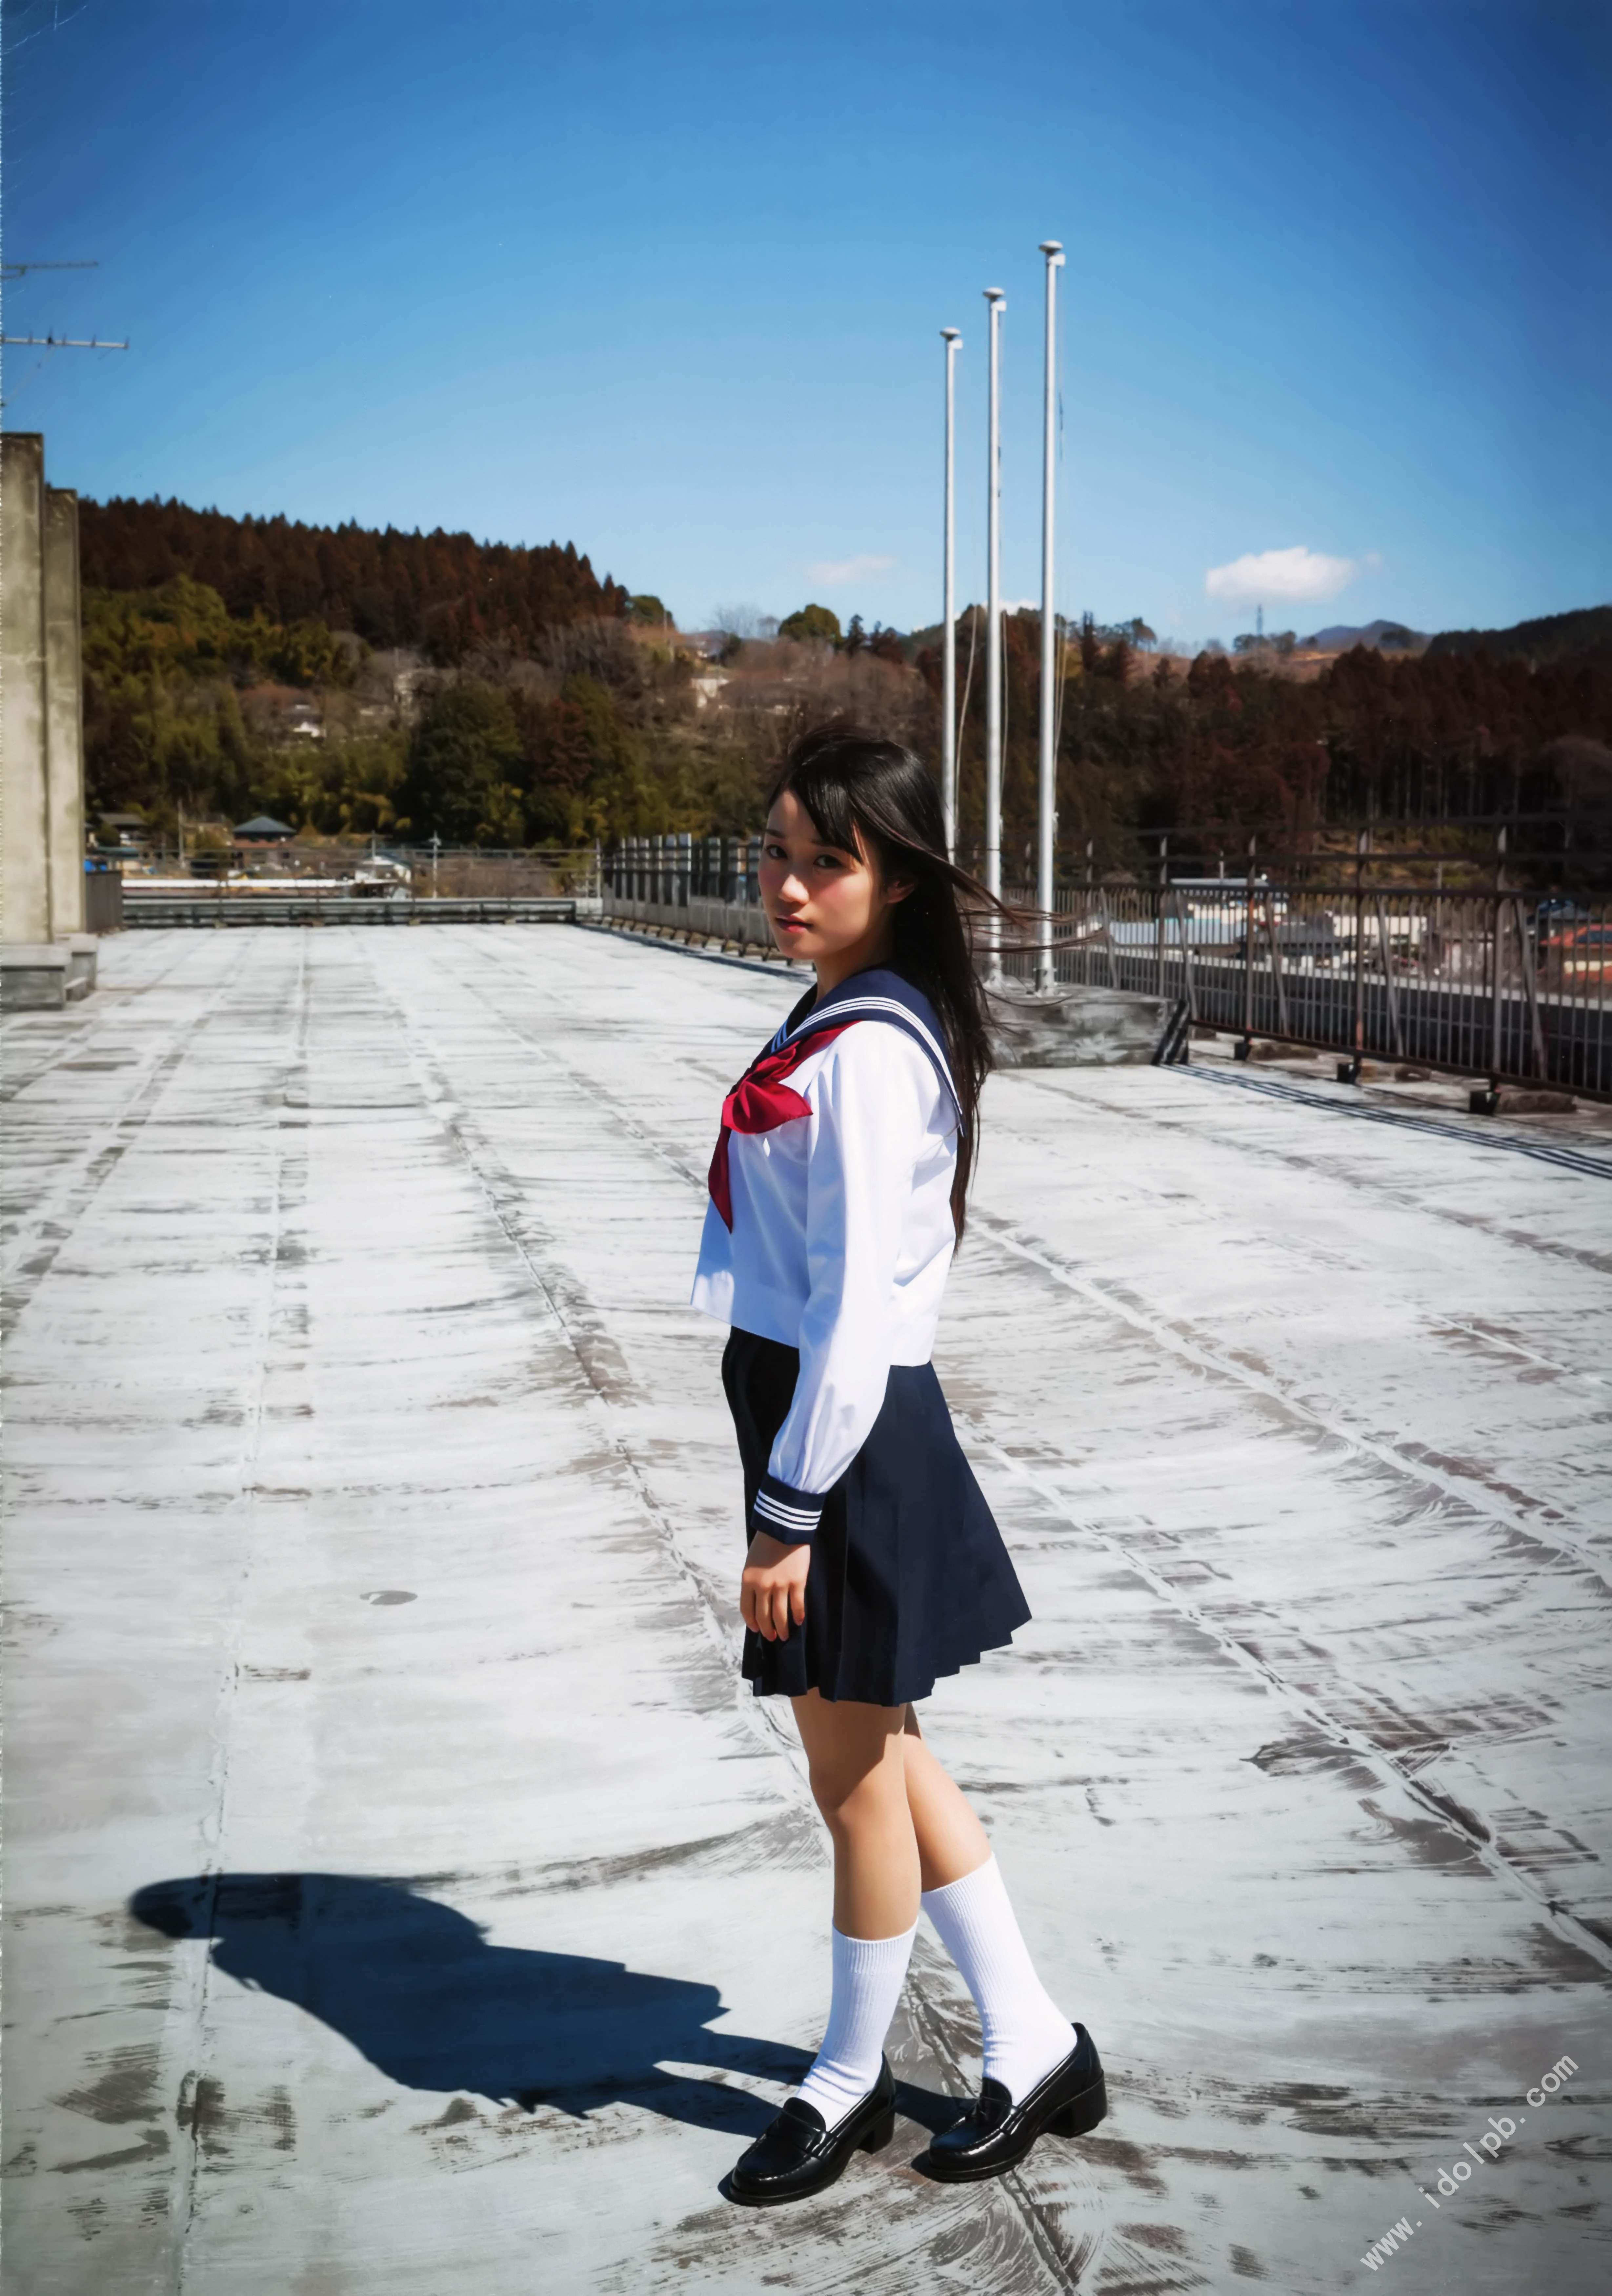 ogura_yui163.jpg